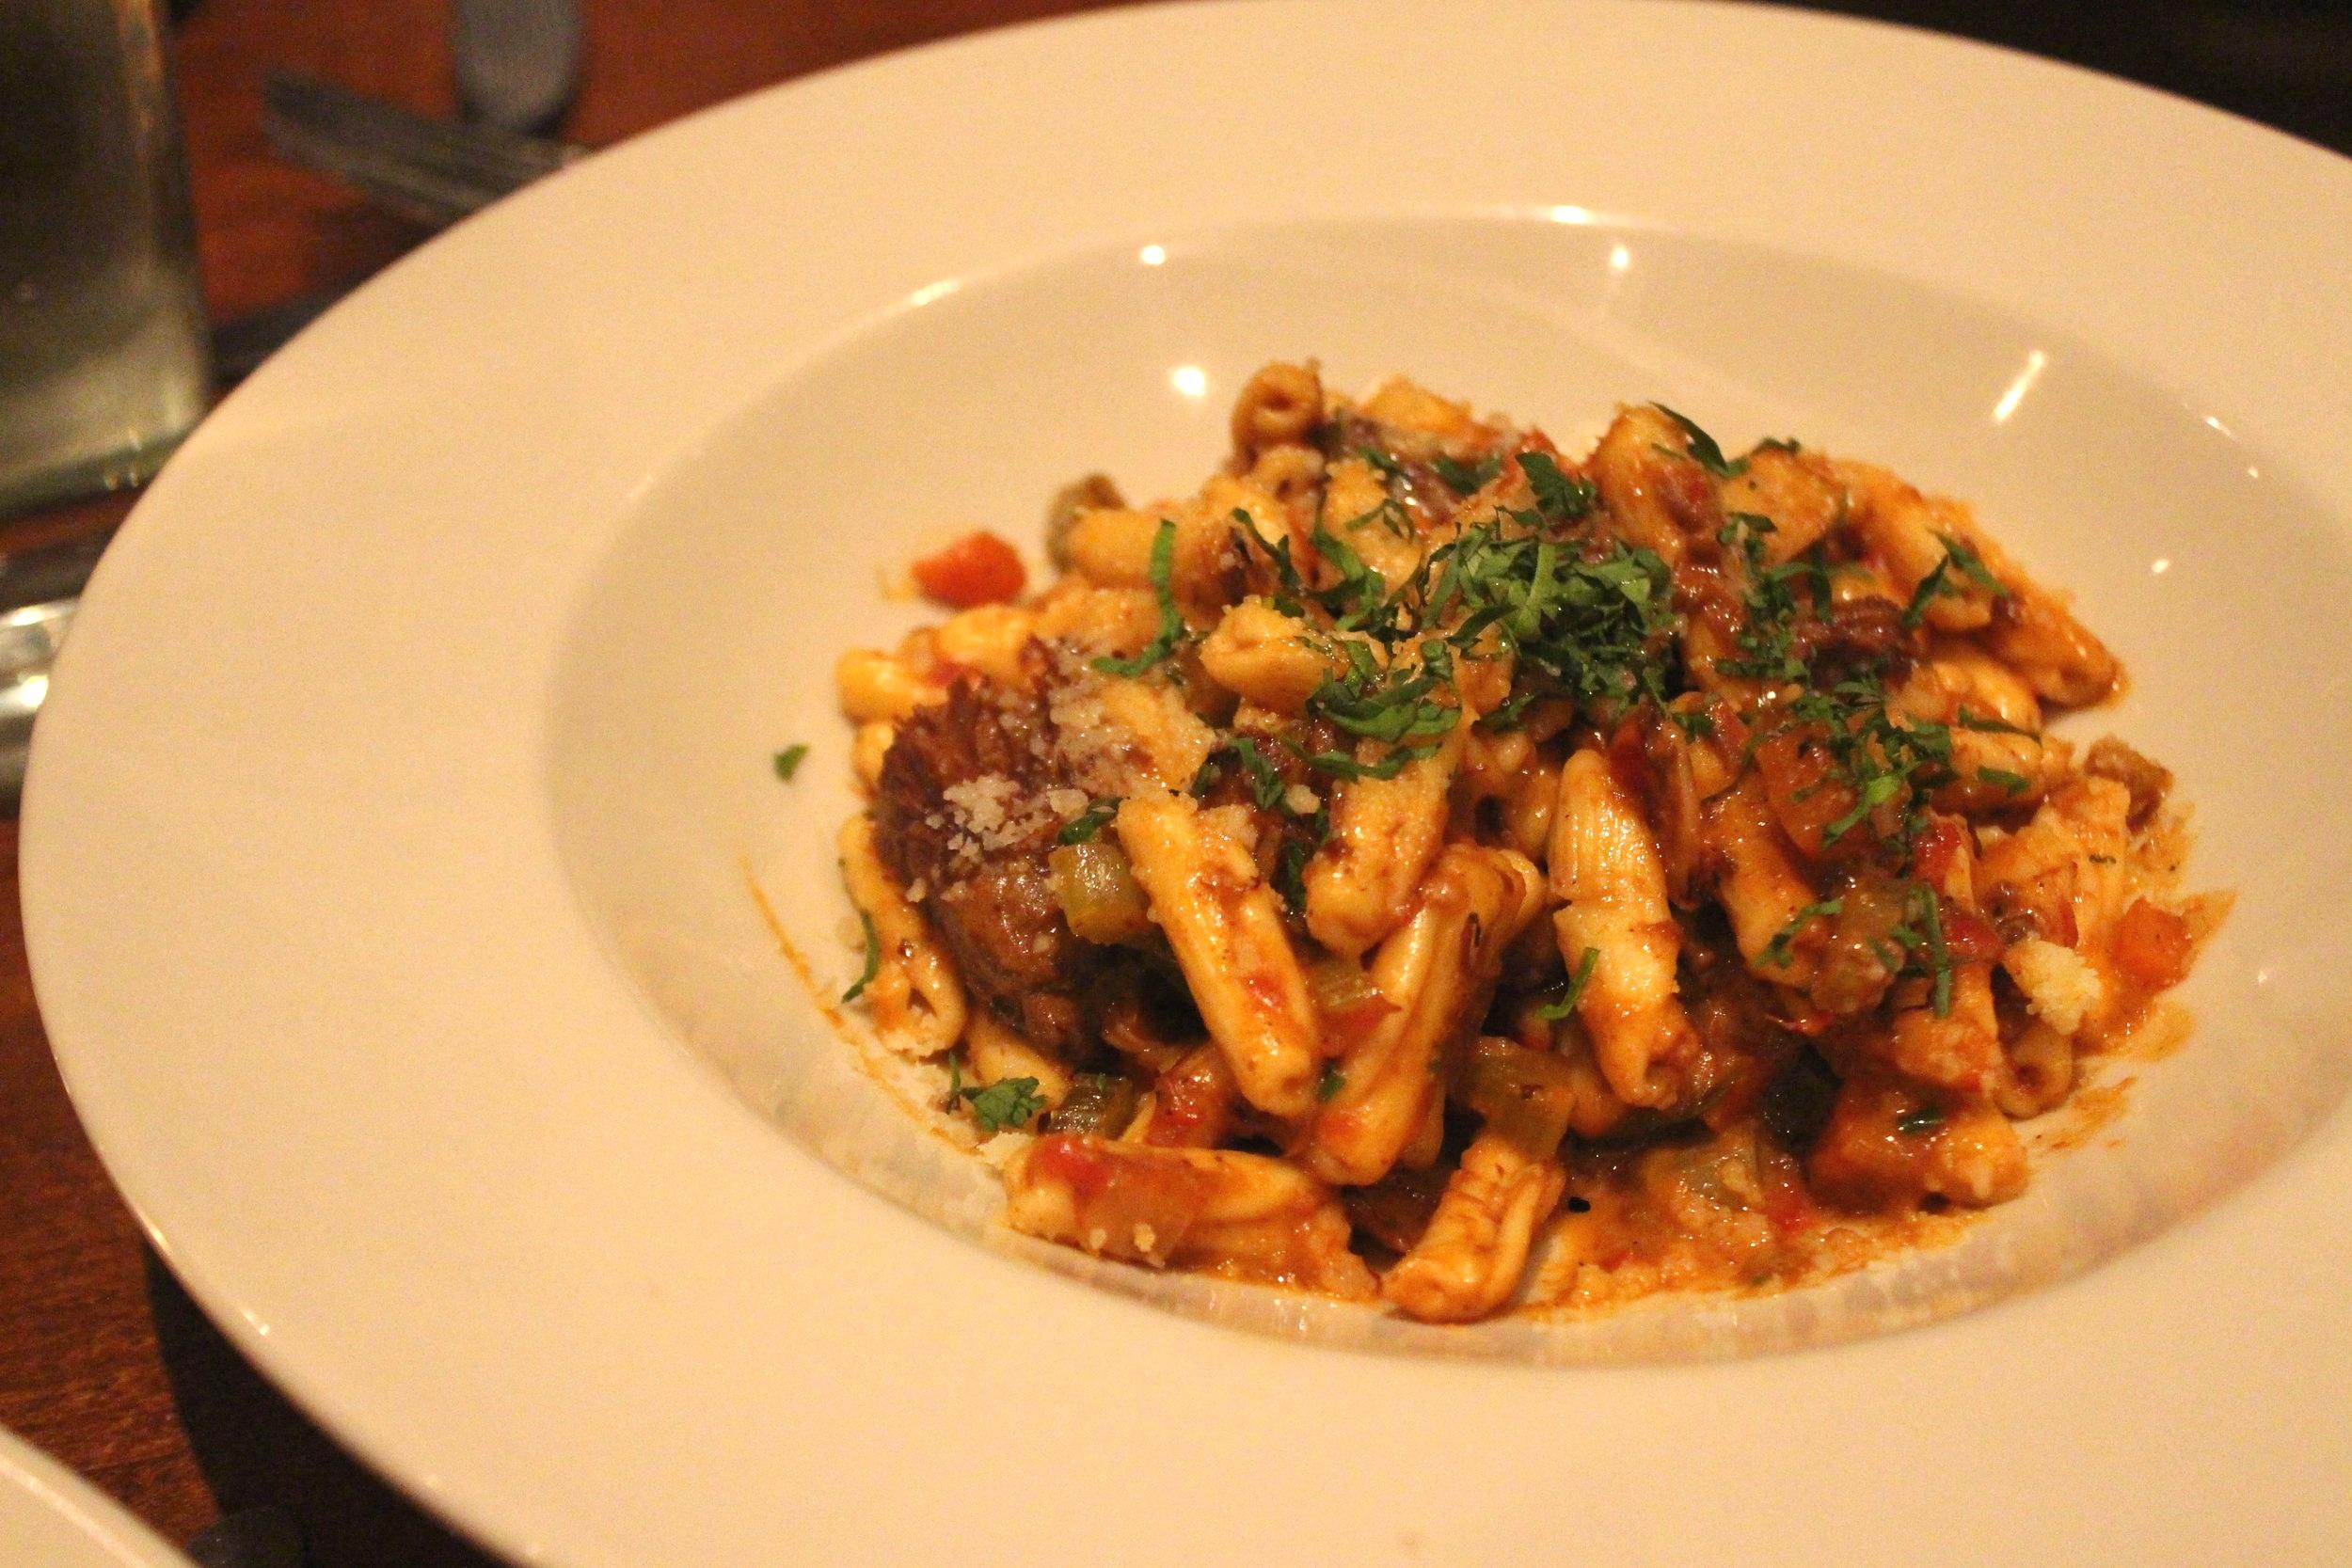 Cavatelli with a ten-hour short rib ragu and mascarpone